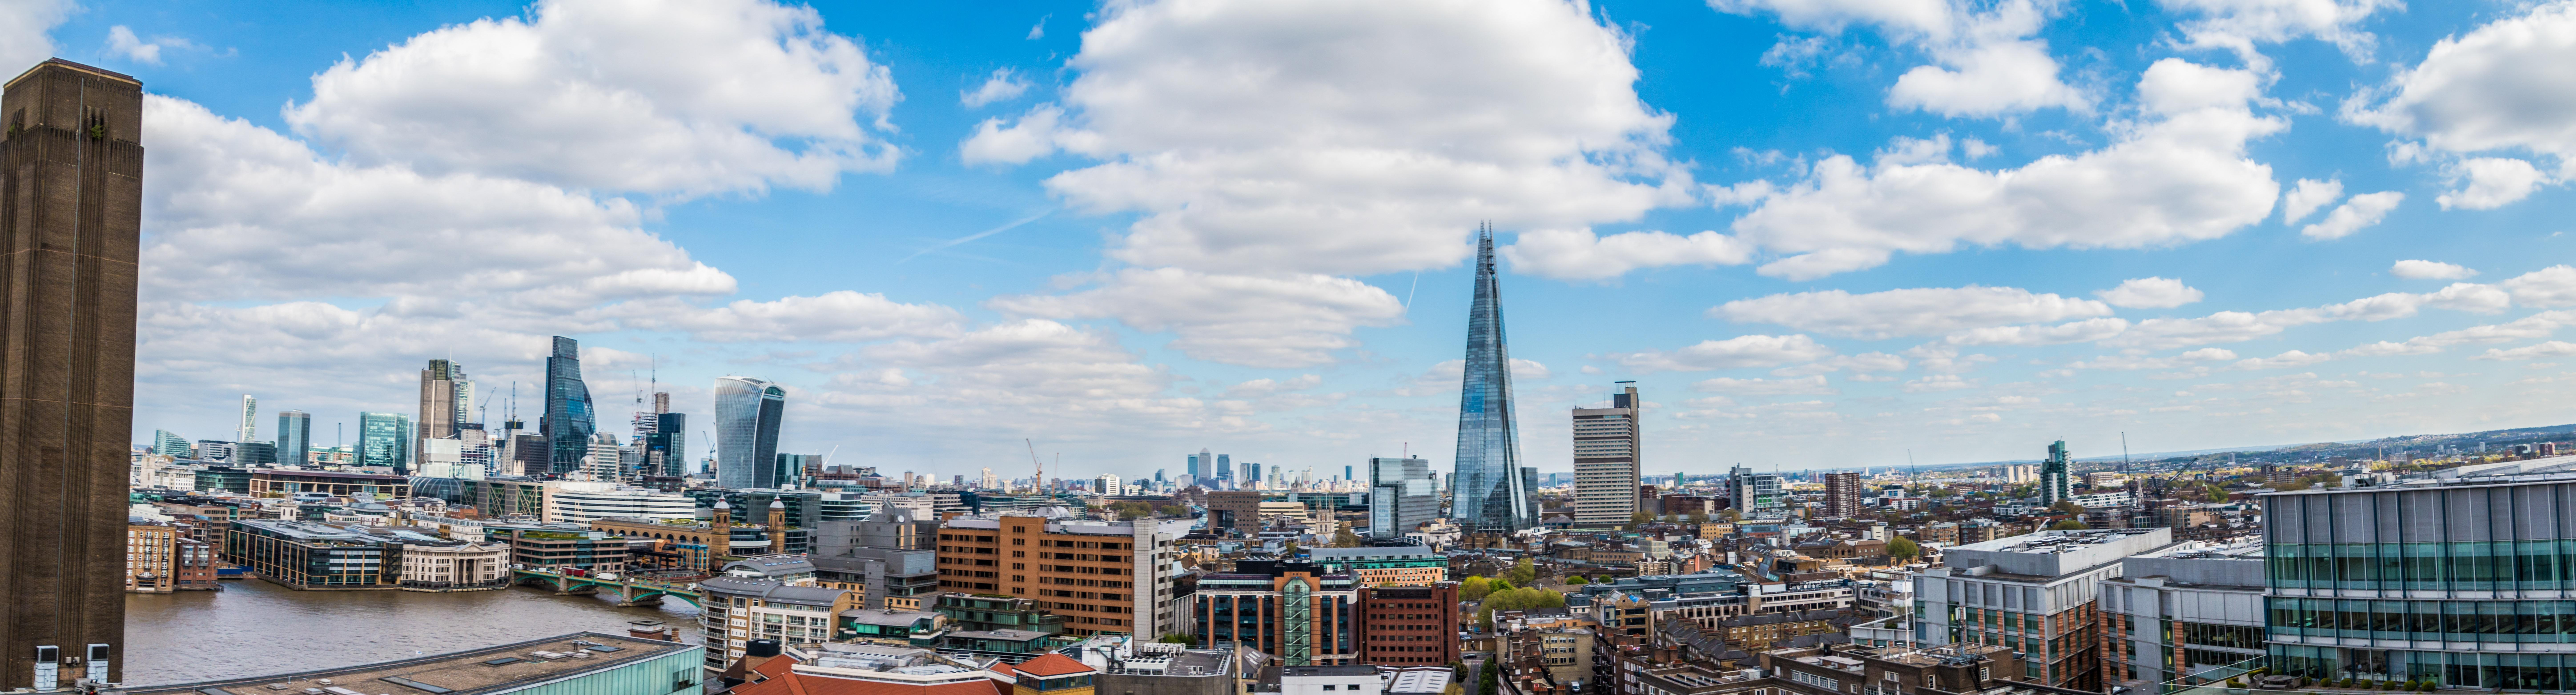 London Buildings Banner Size